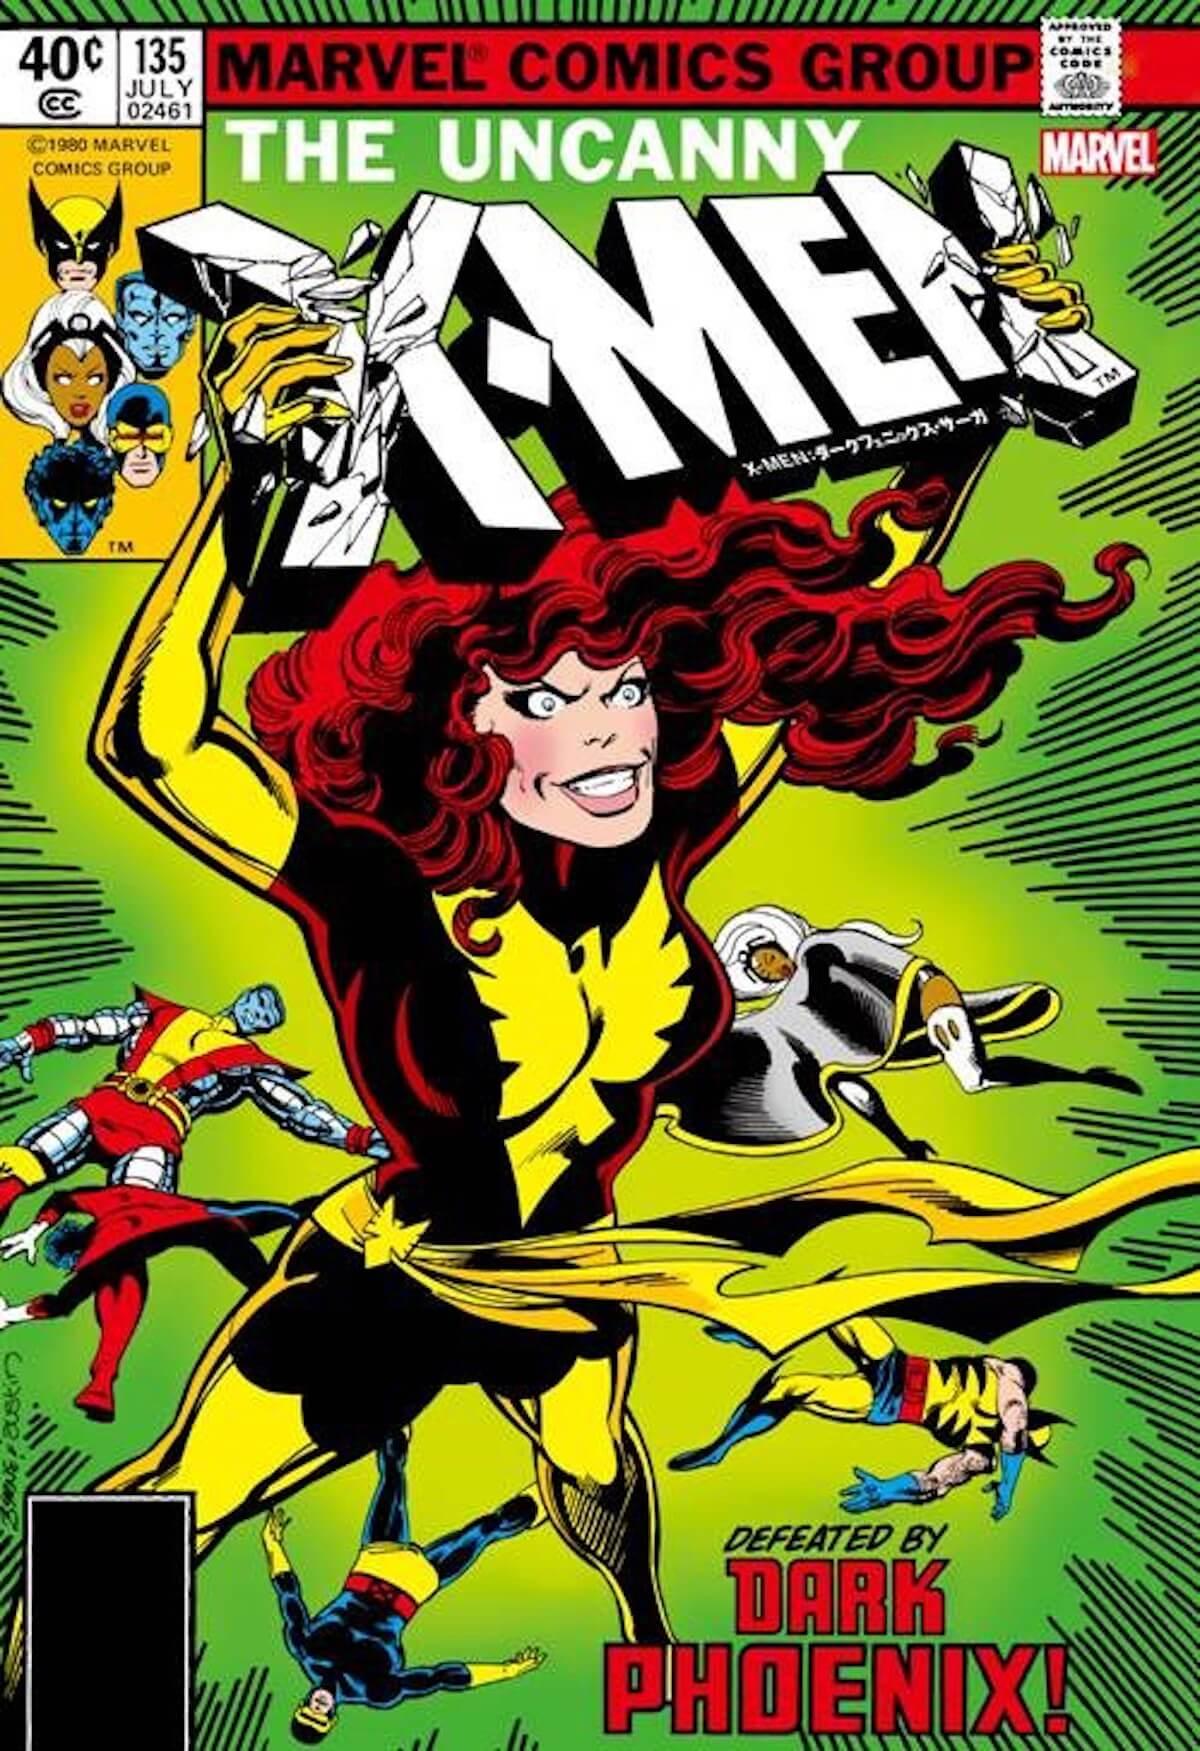 『X-MEN:ダーク・フェニックス』の監督が語る原作『ダーク・フェニックス・サーガ』の魅力とは? dark-phoenix_book